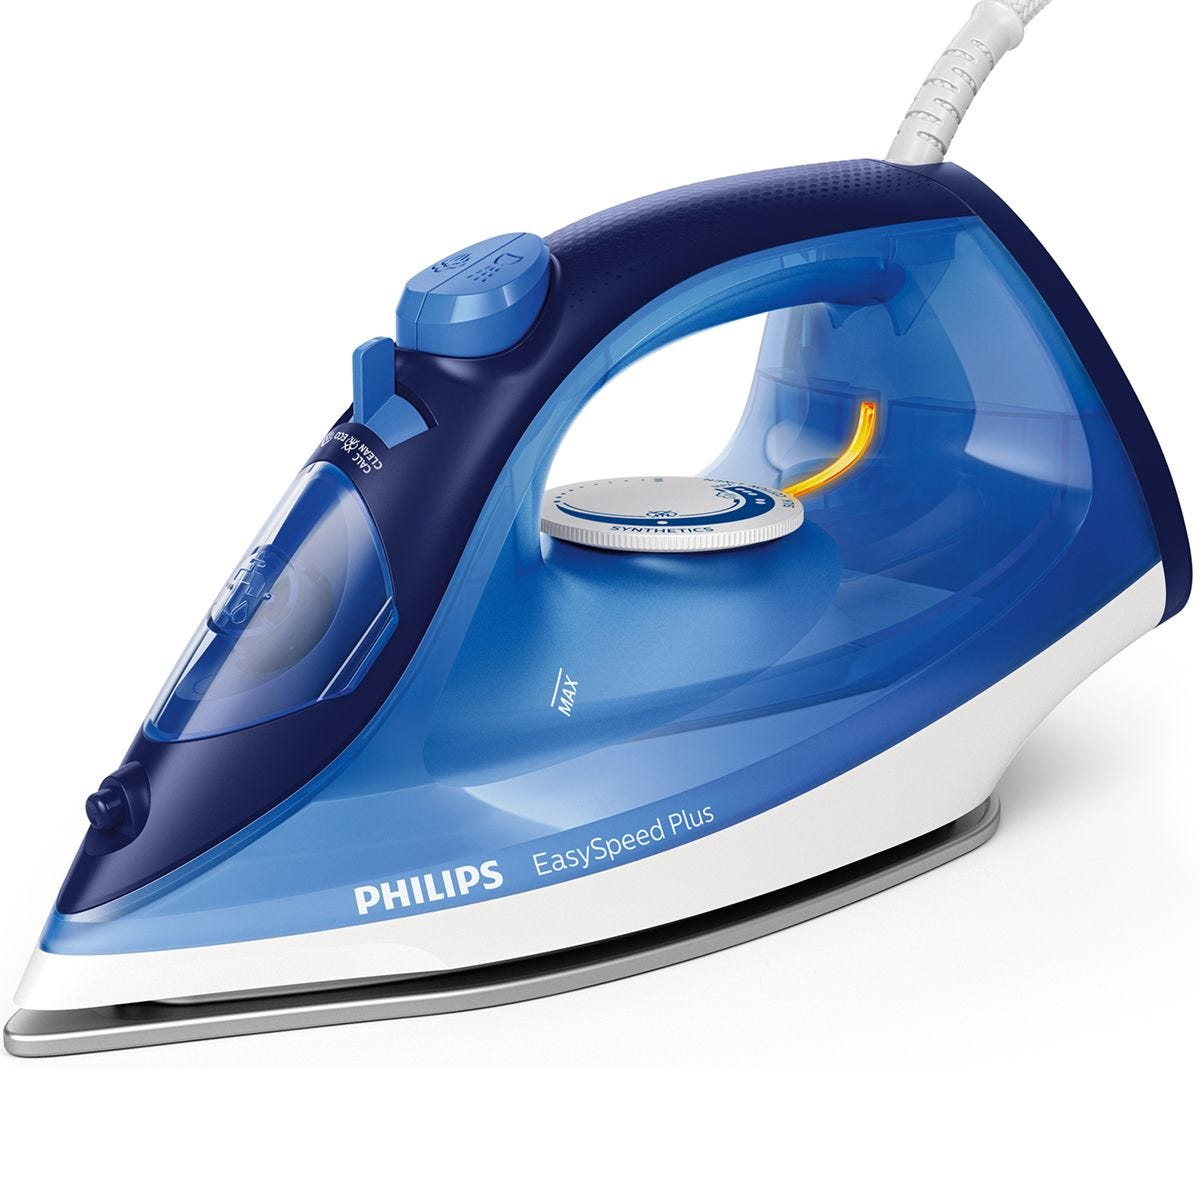 Philips Easy Speed Plus Steam Iron - Blue